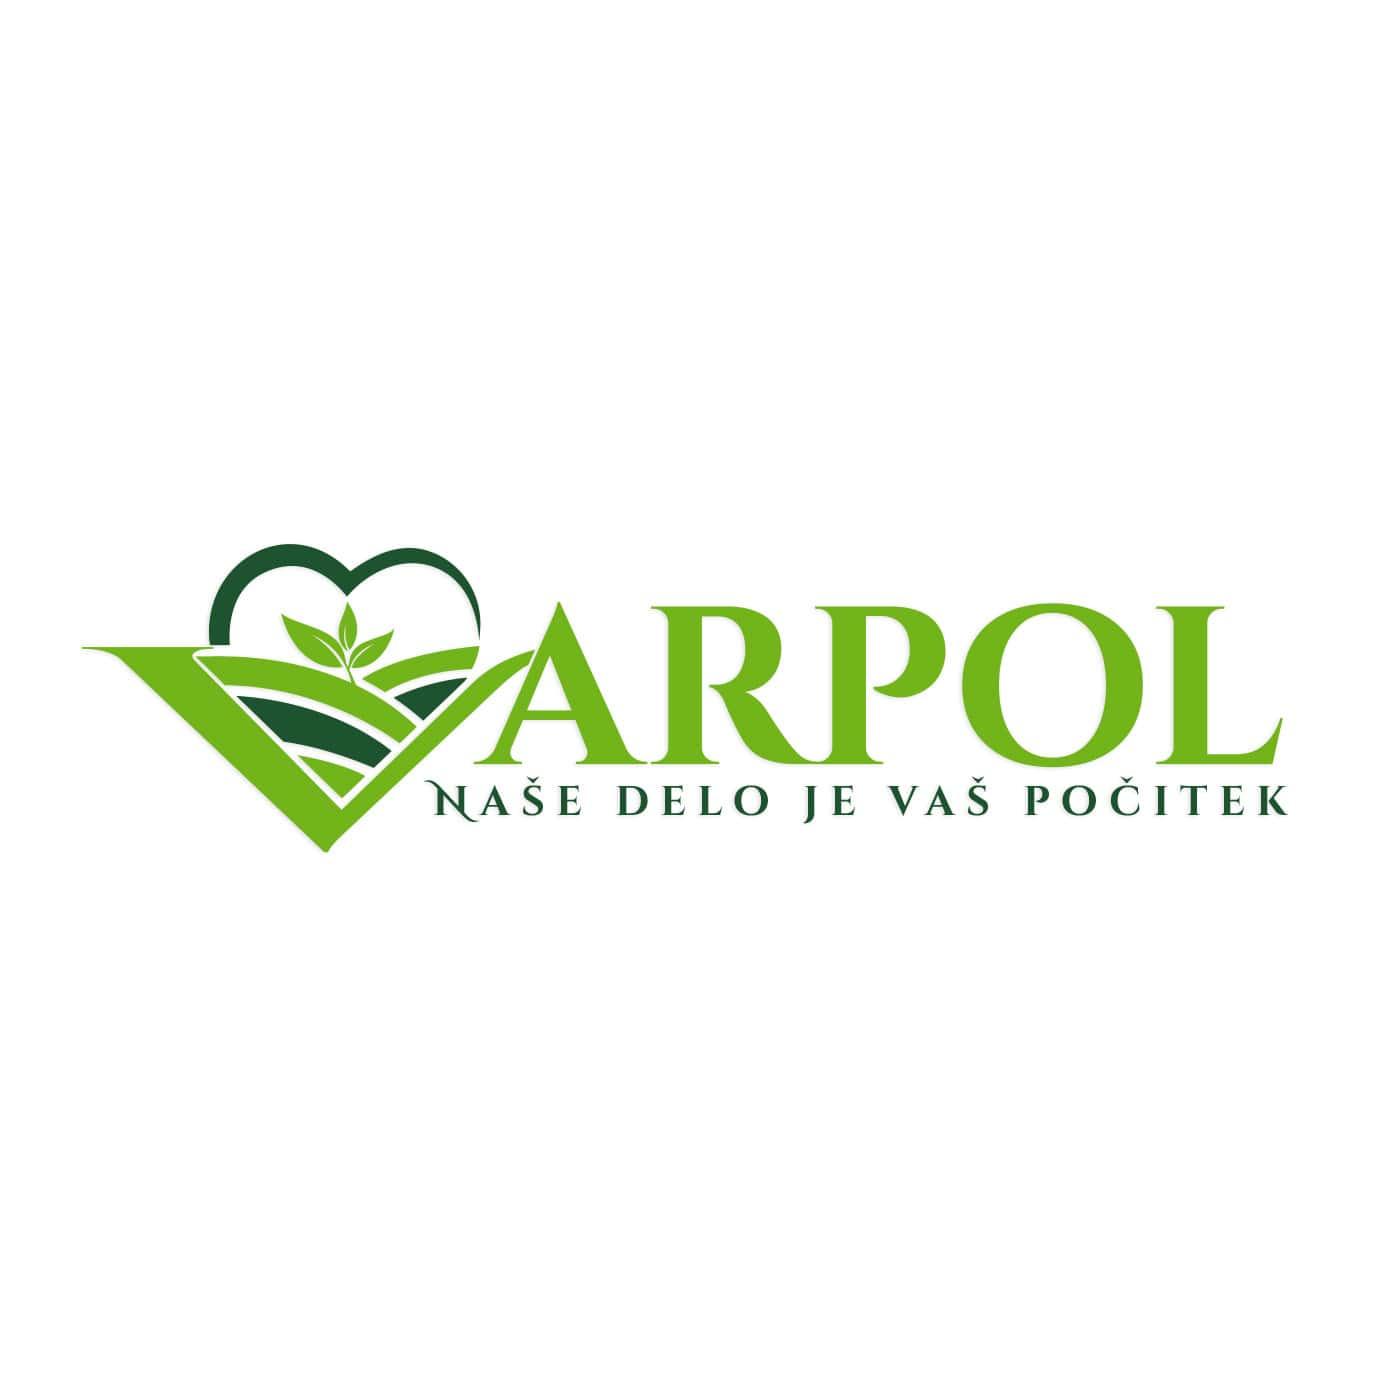 varpol_logotip-min